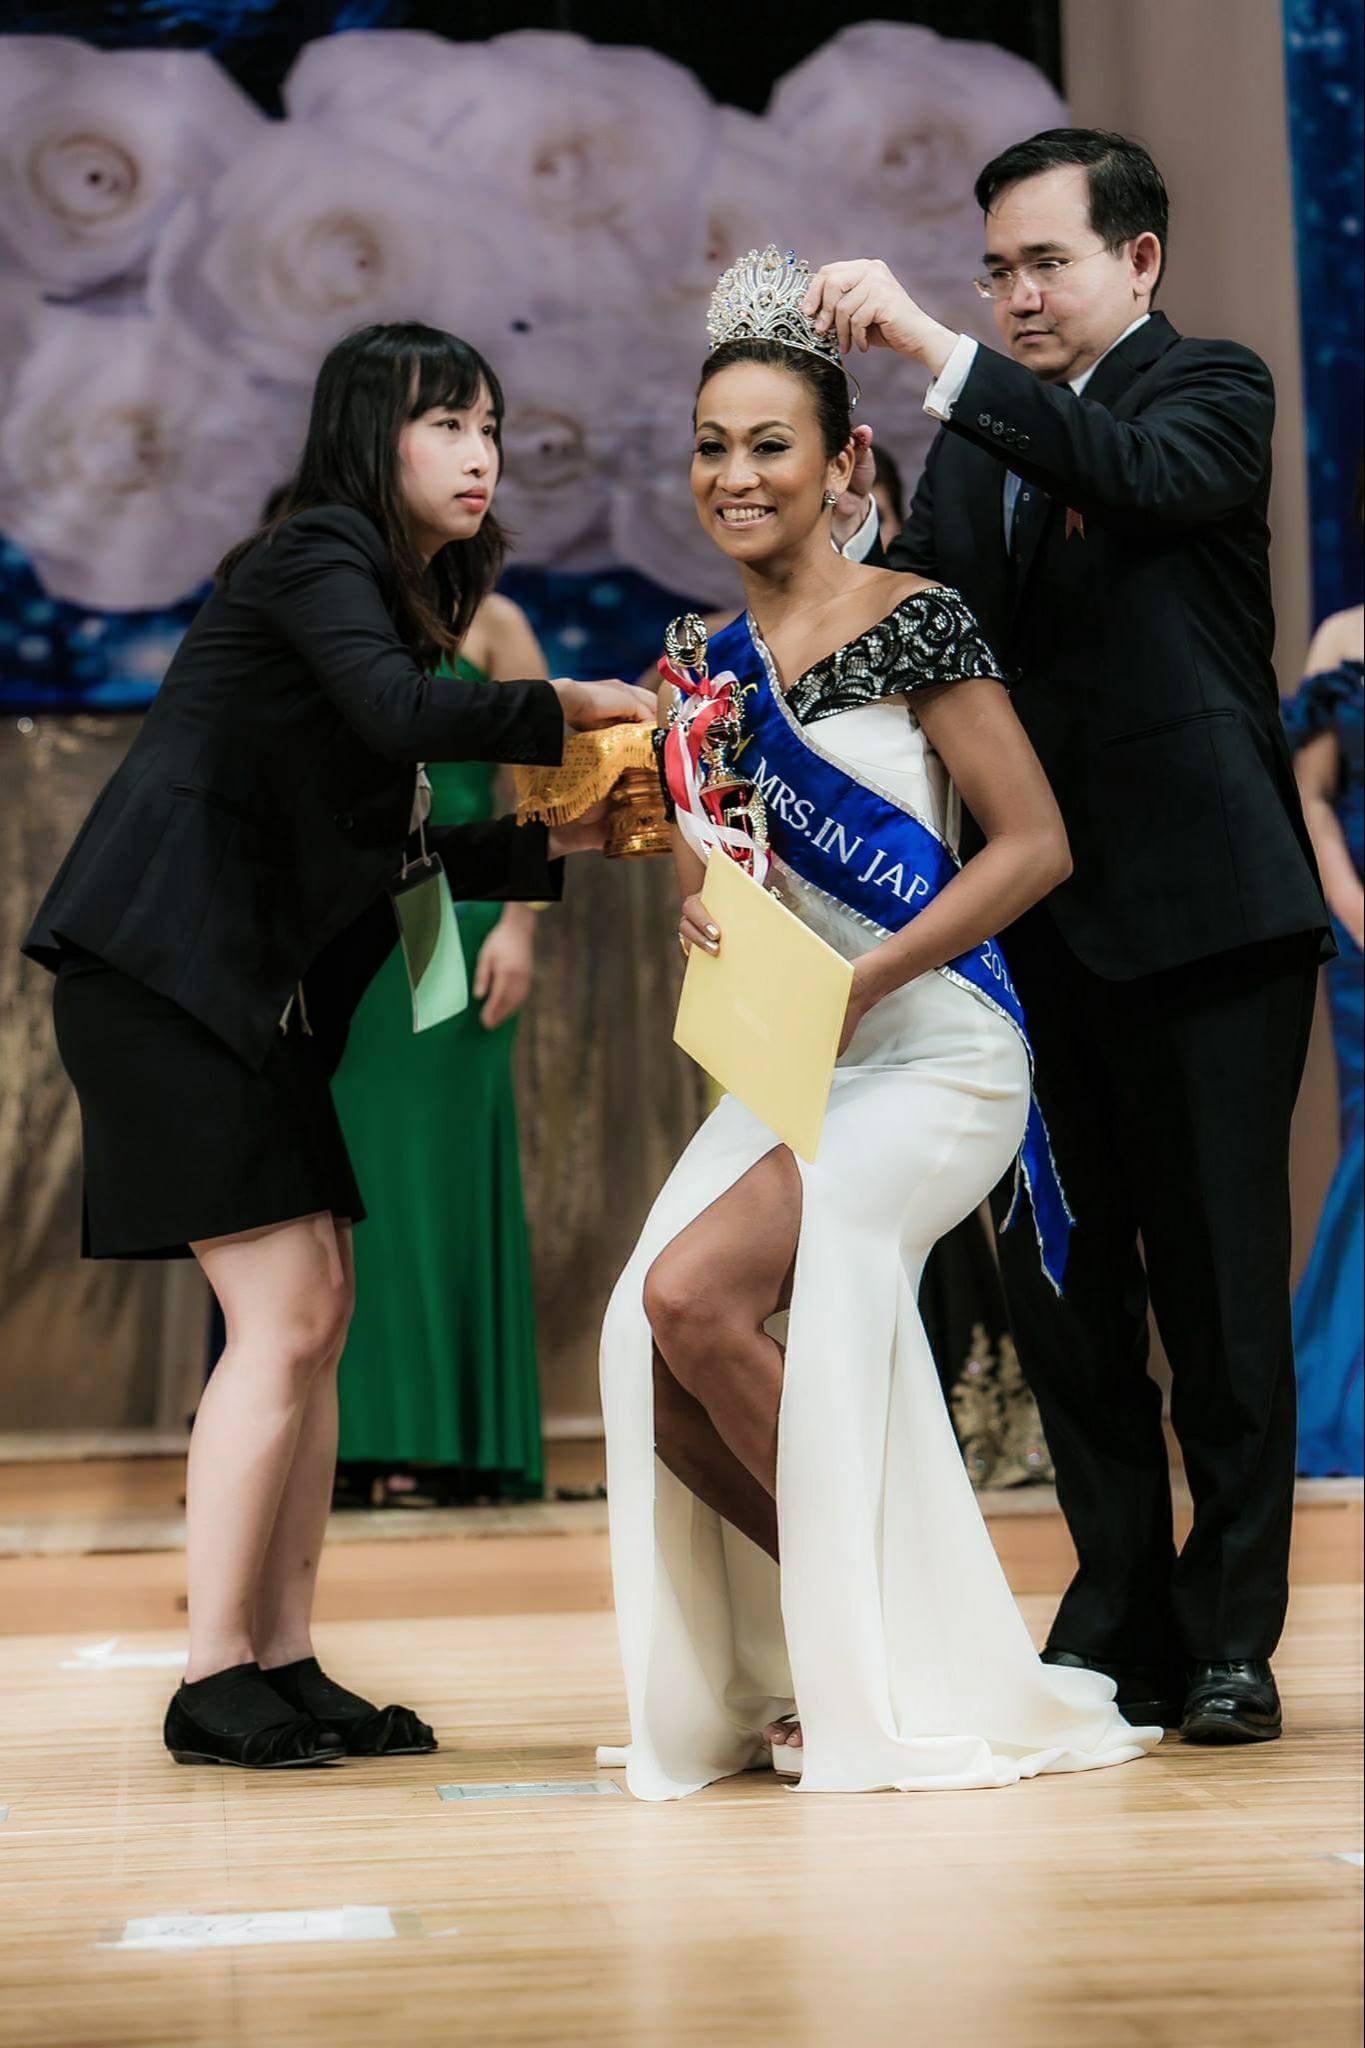 maria-awards-image